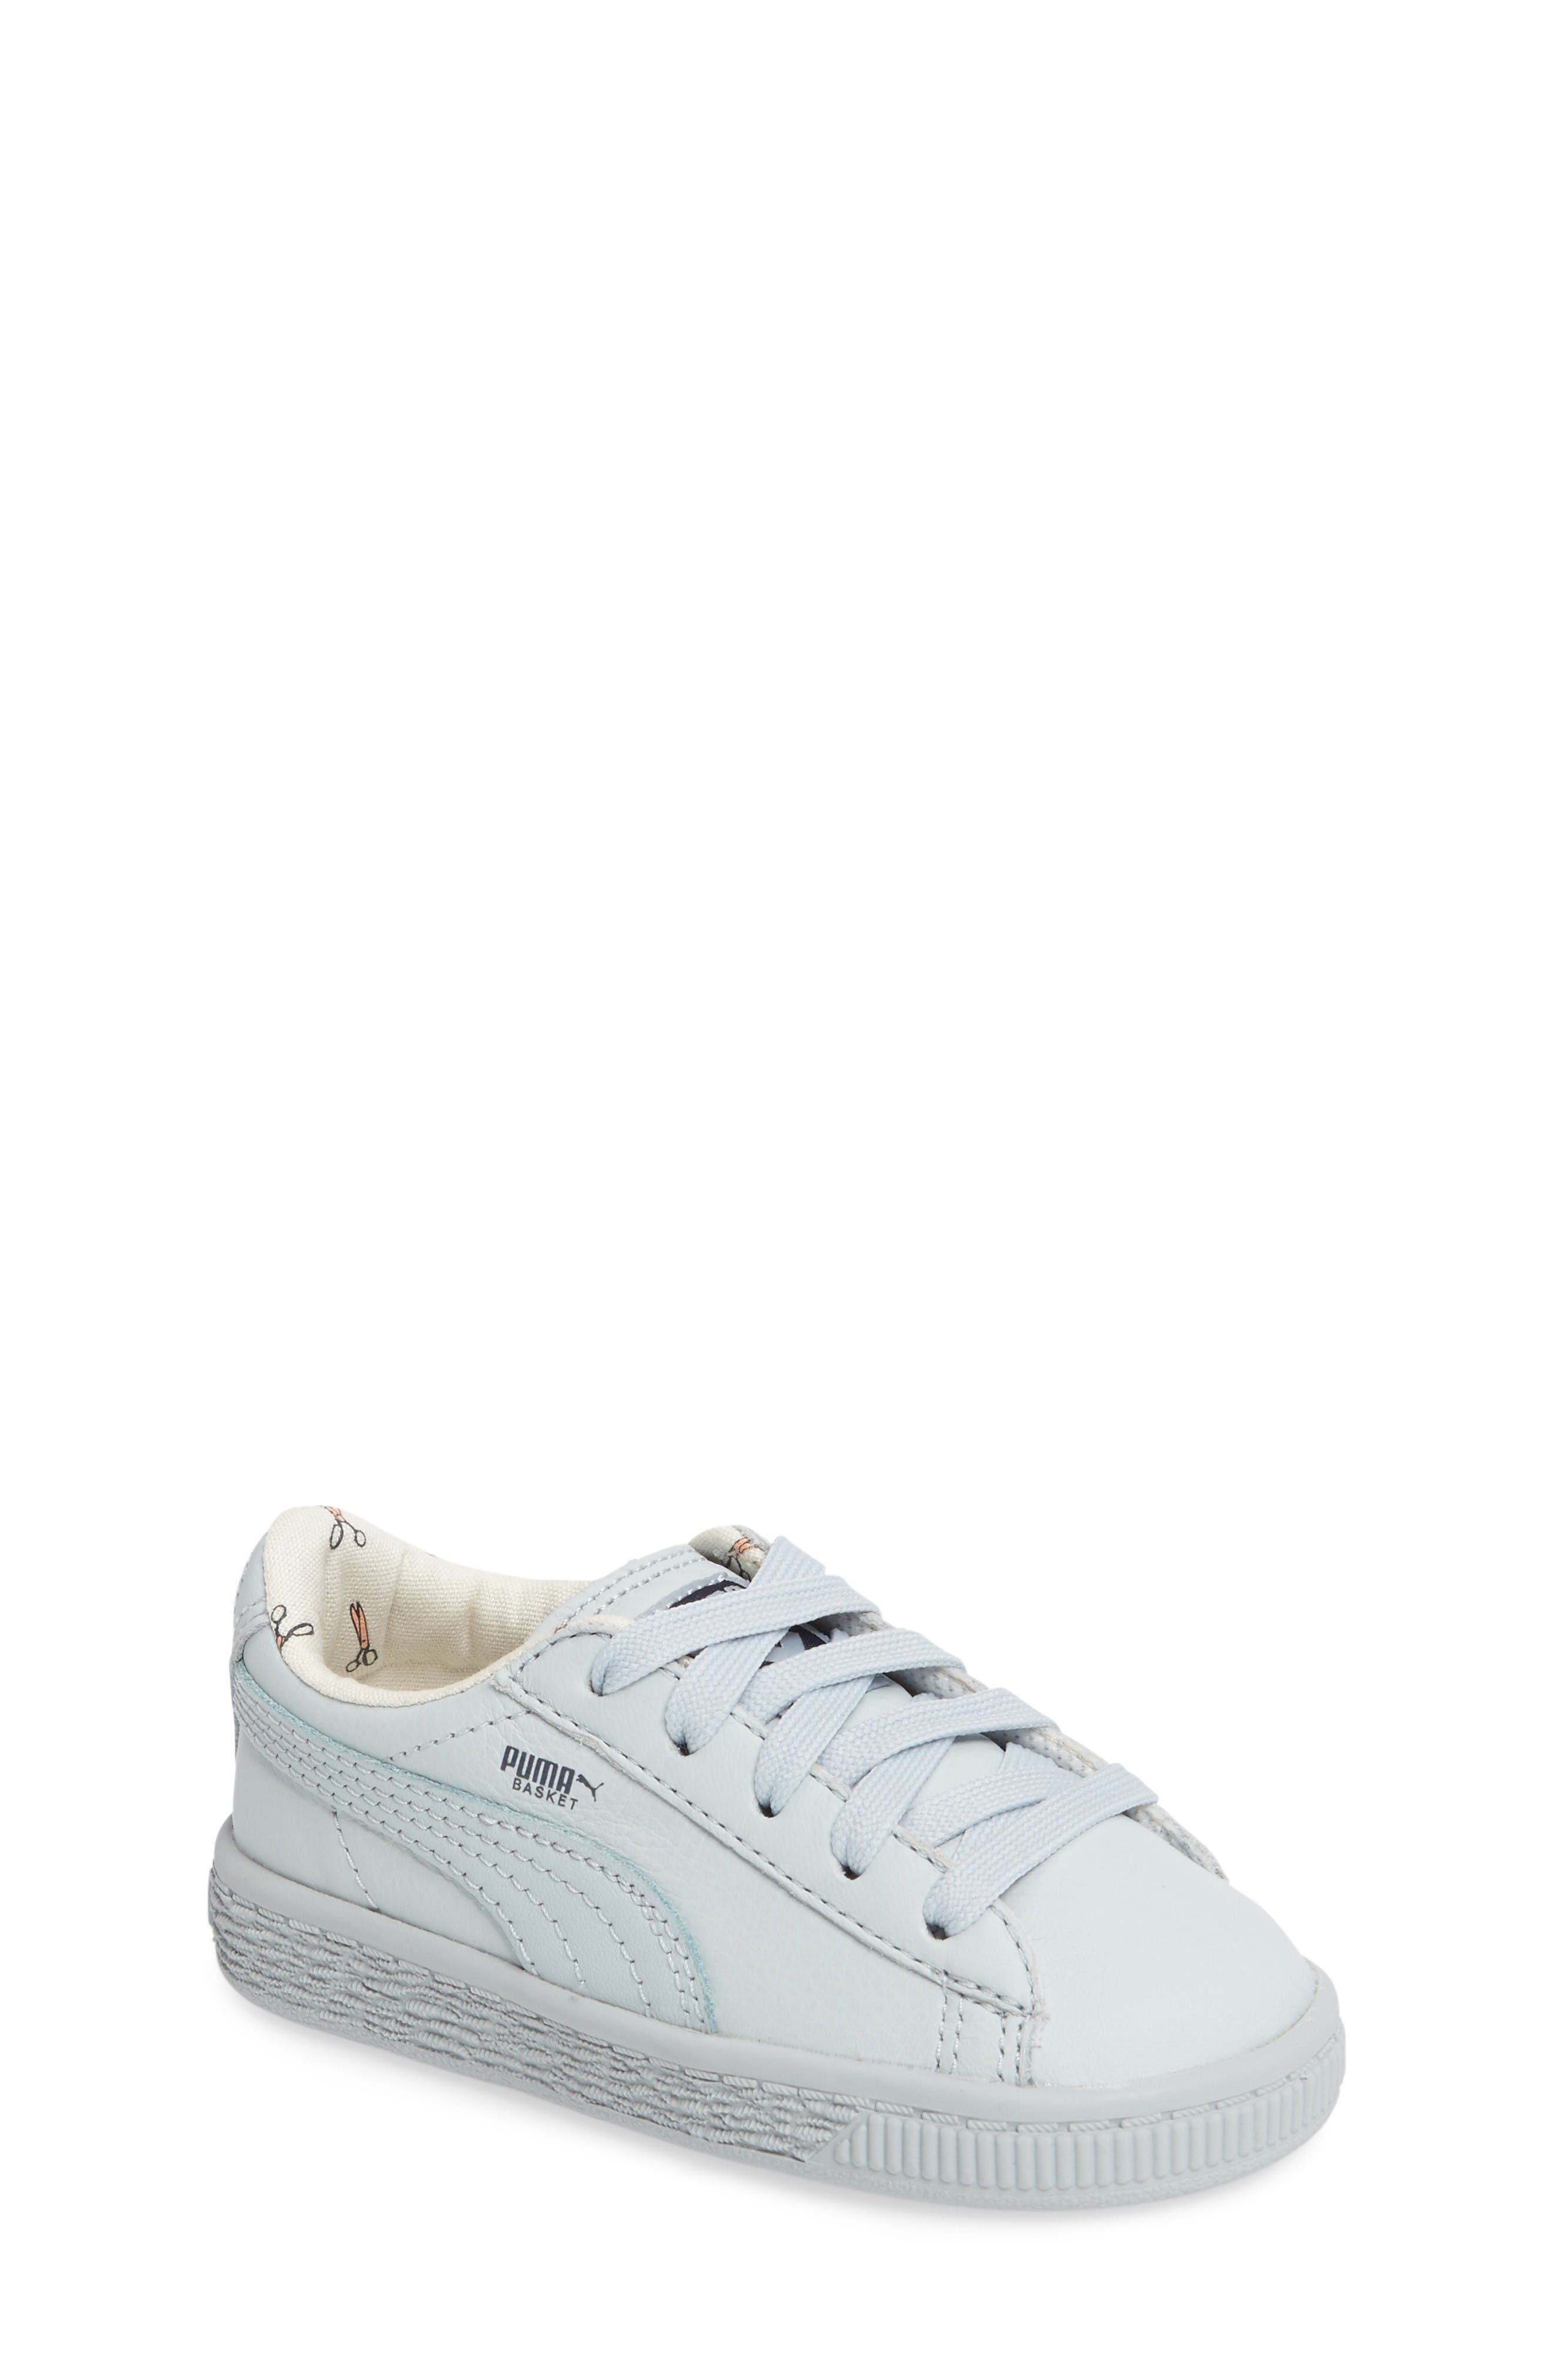 PUMA x tinycottons Basket Sneaker